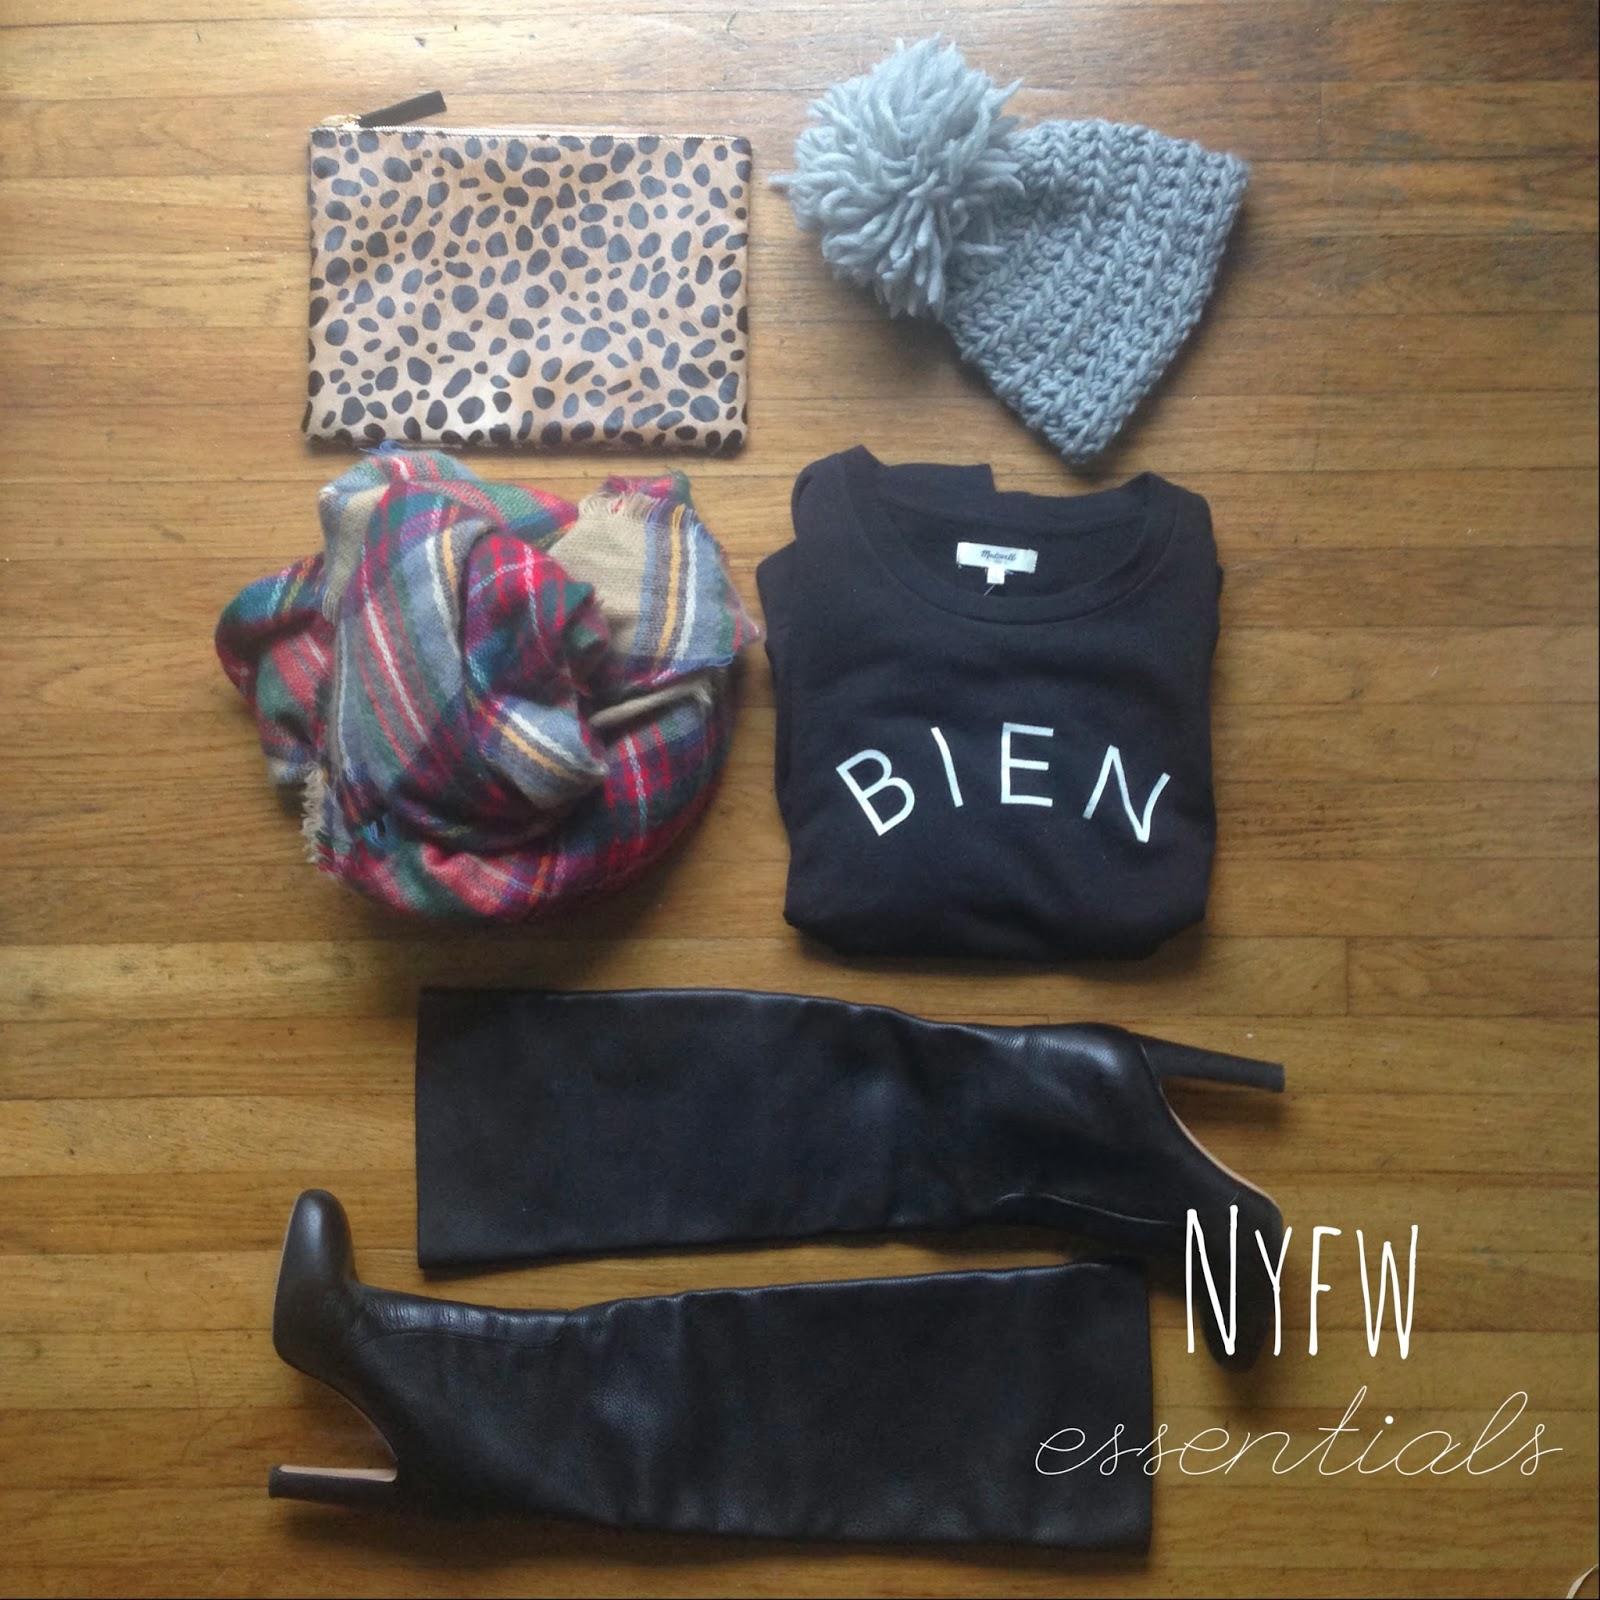 NYFW essentials boots leopard plaid scarf bag